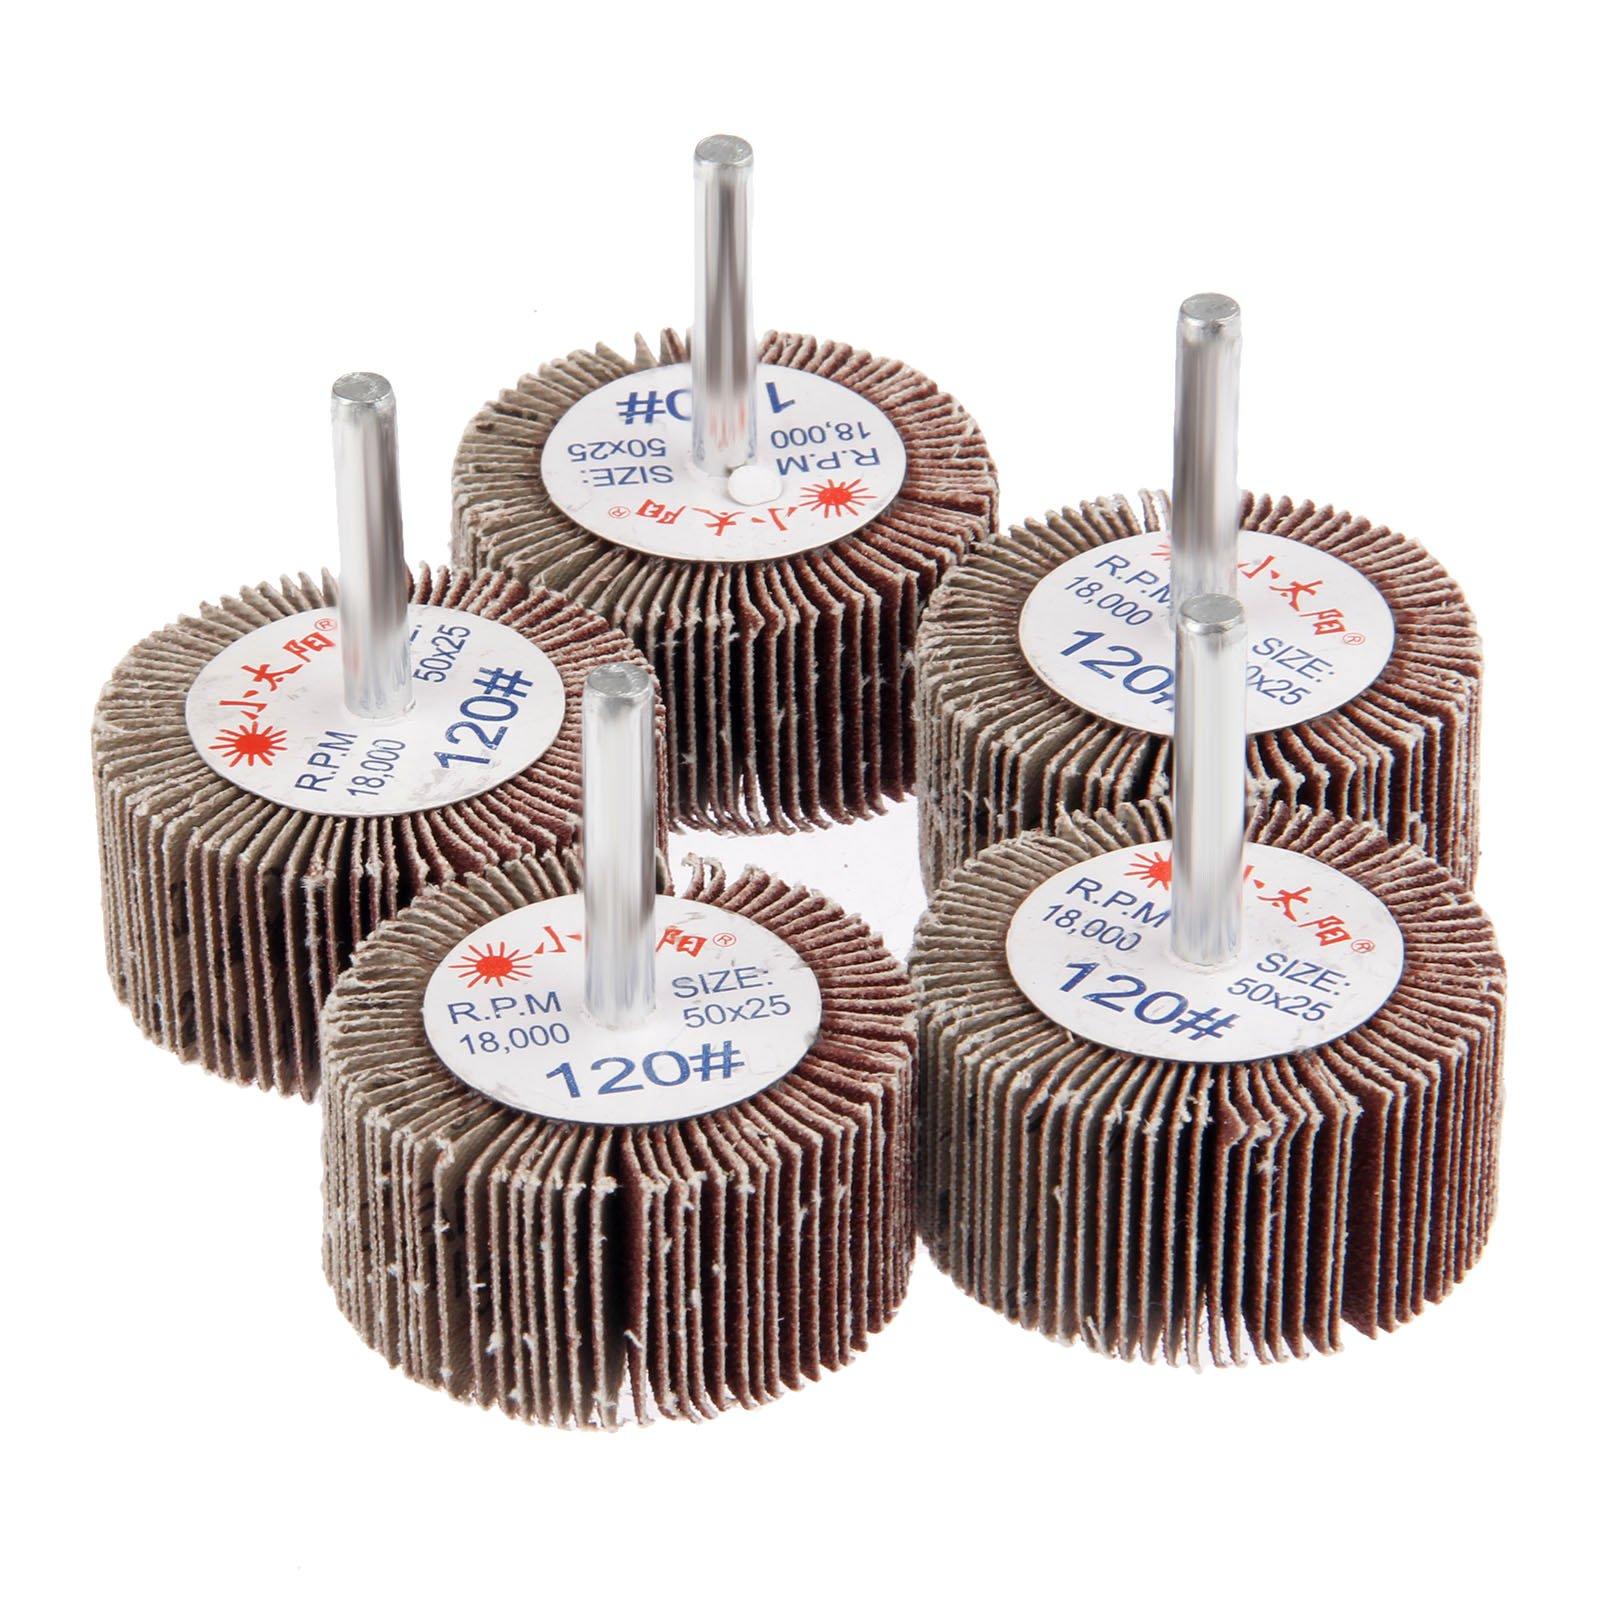 Dophee 5Pcs 120# Grit 50x25x6mm Sanding Grinding Aluminum Oxide Flap Wheels For Rotary Tools